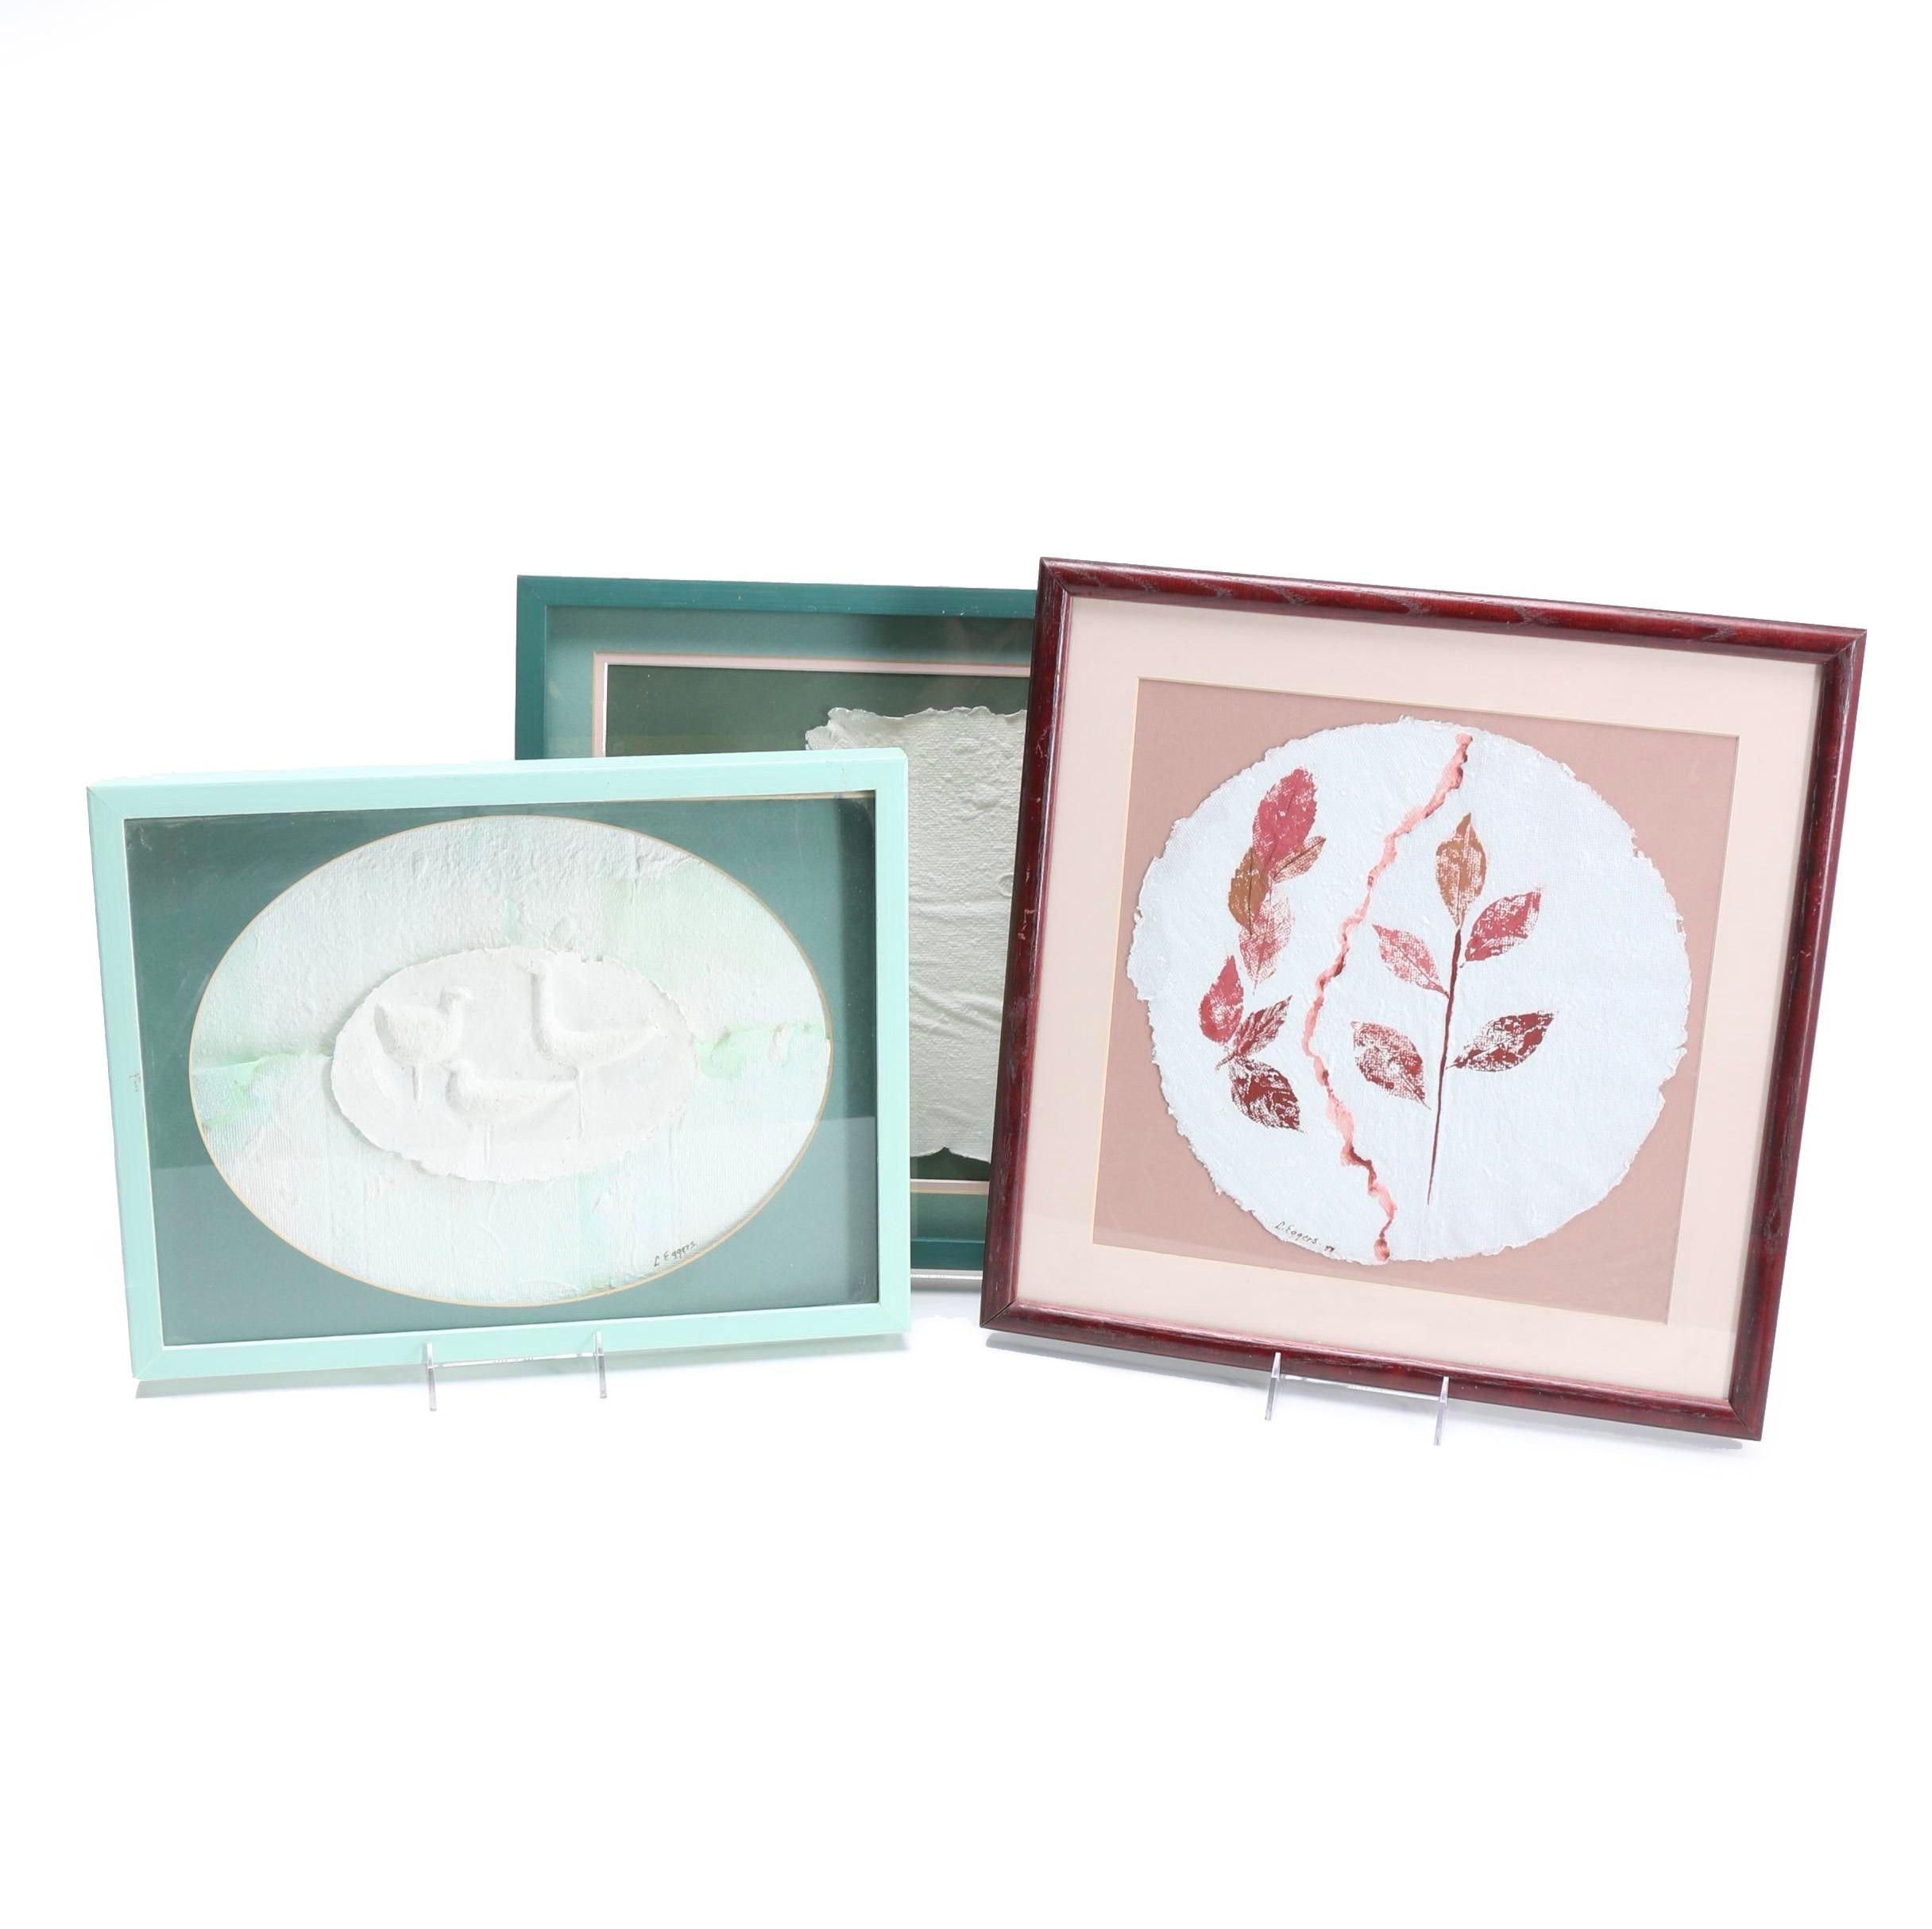 L. Eggers Handmade Rag Paper Reliefs Featuring Nature